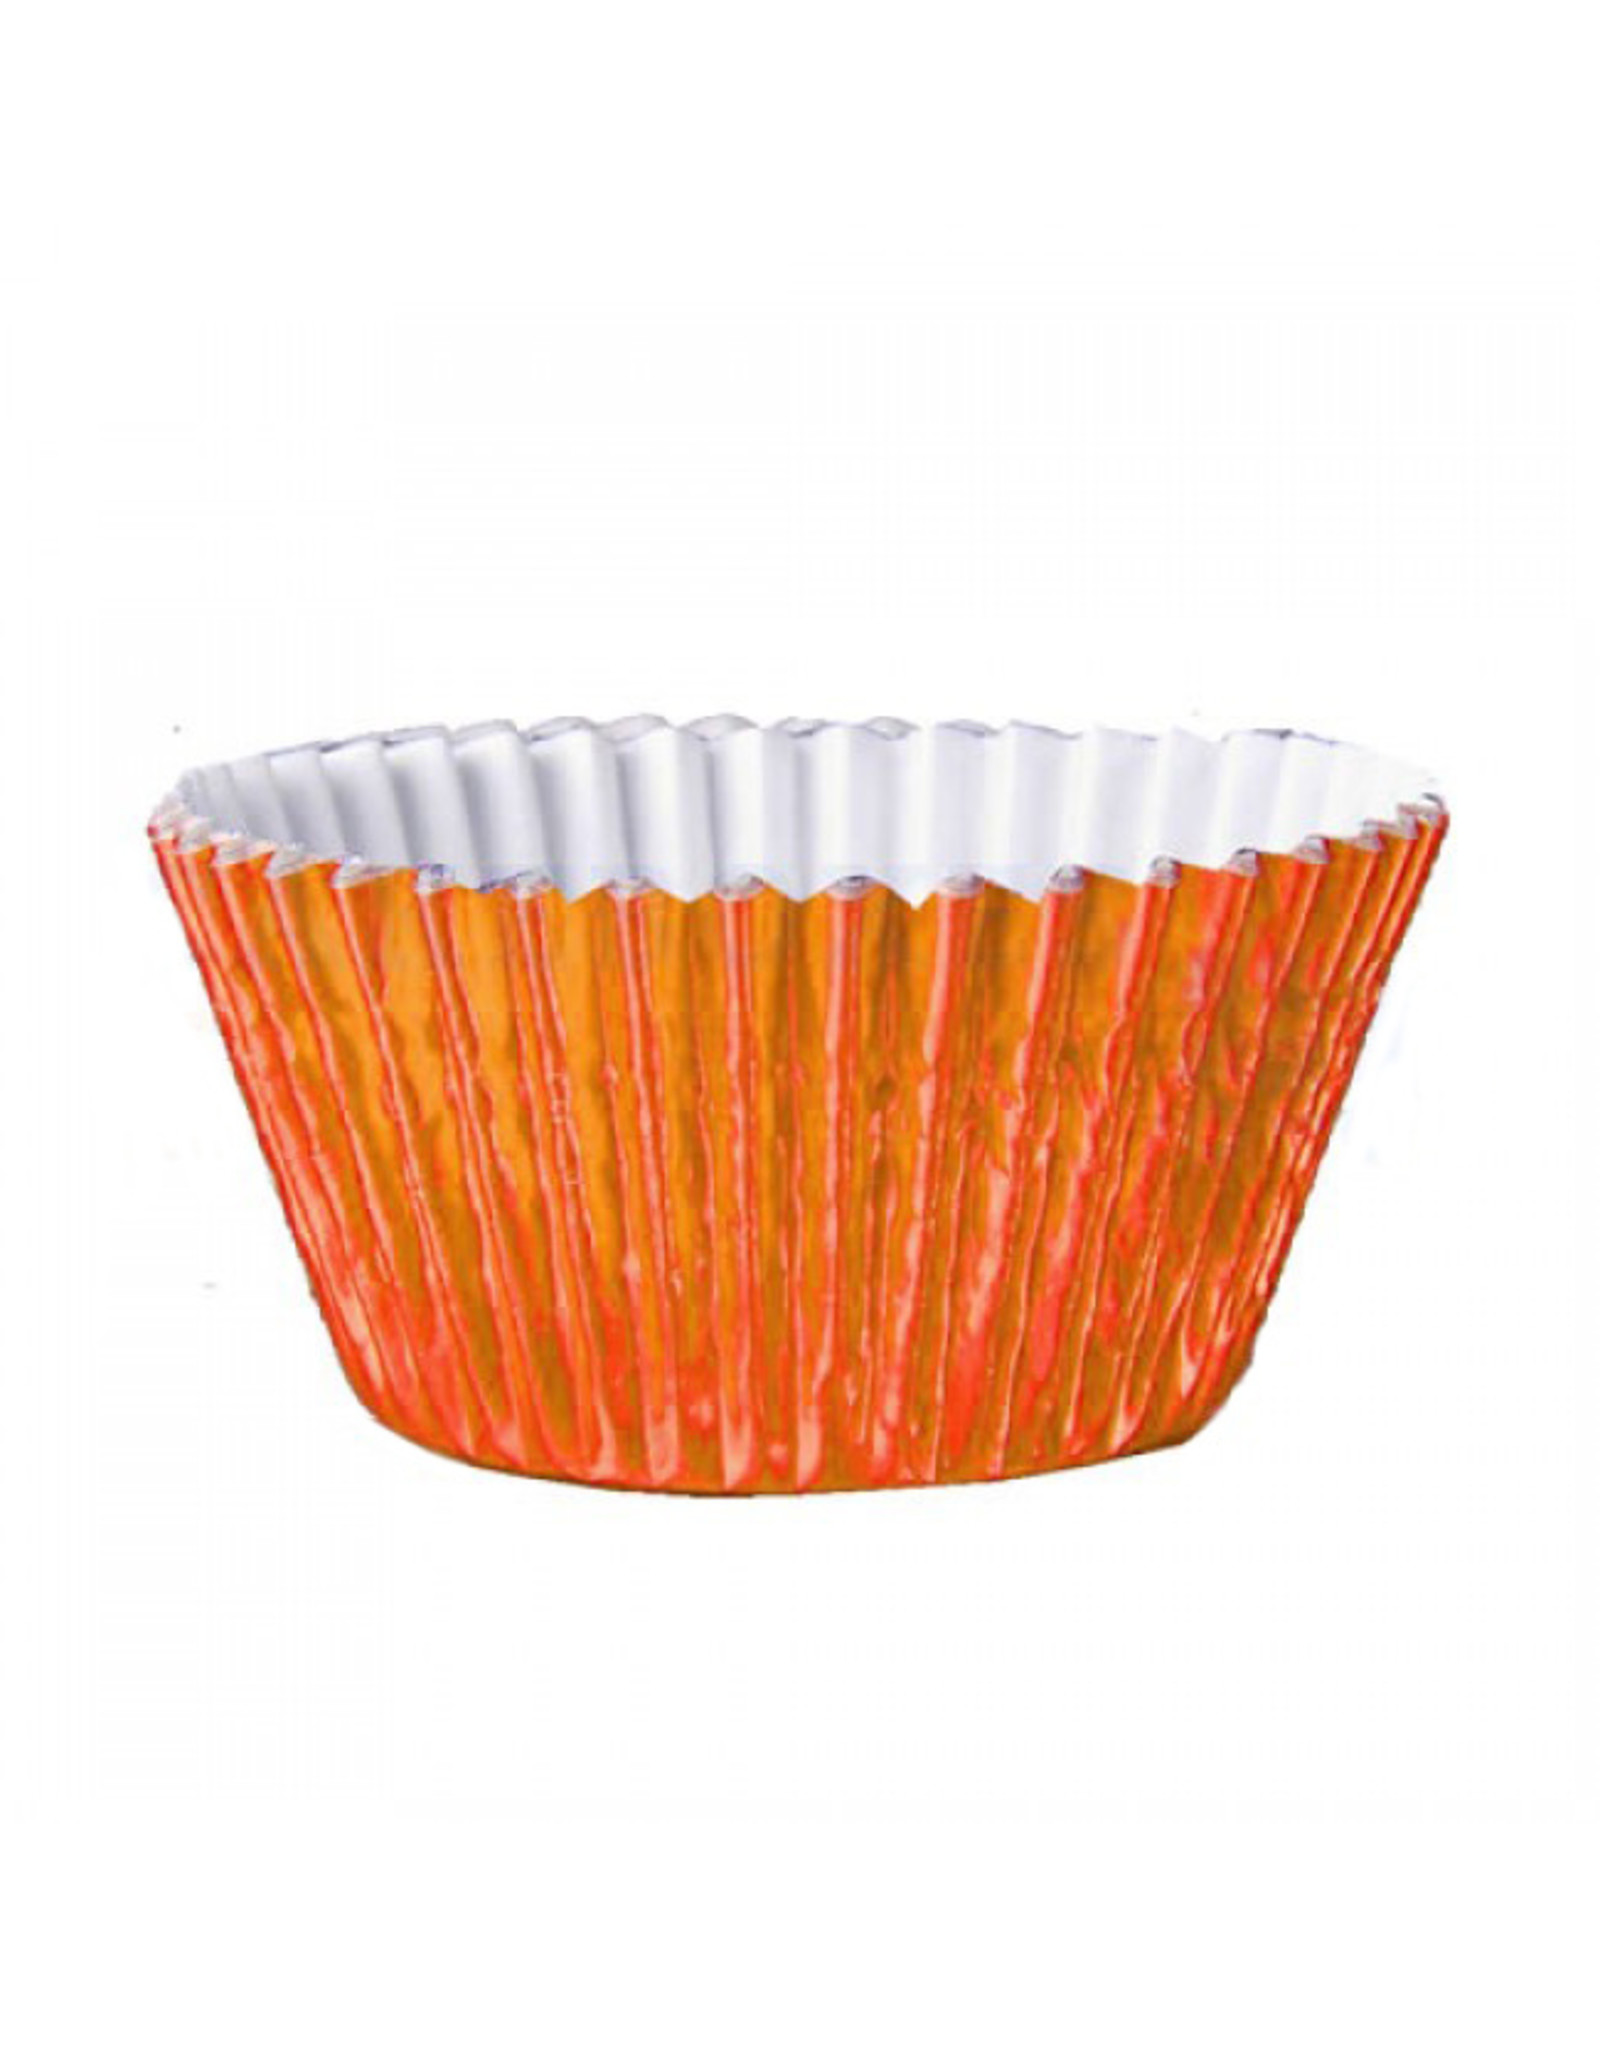 Metallic baking cups - orange (500 pieces)